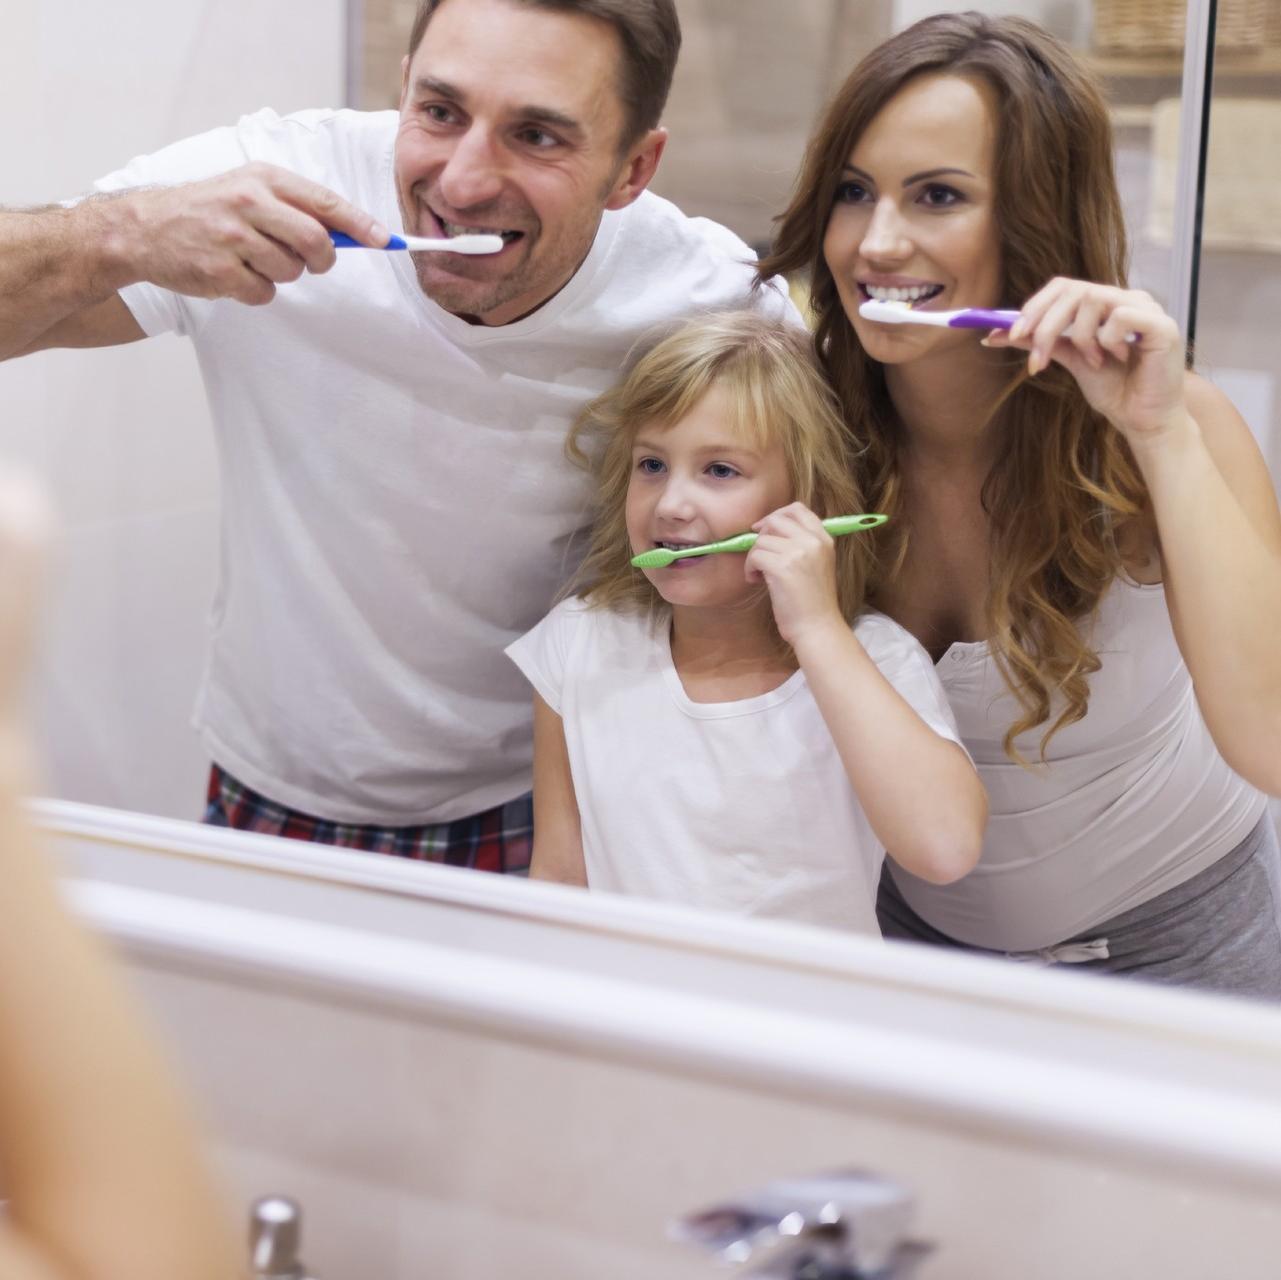 L'hygiène bucco-dentaire